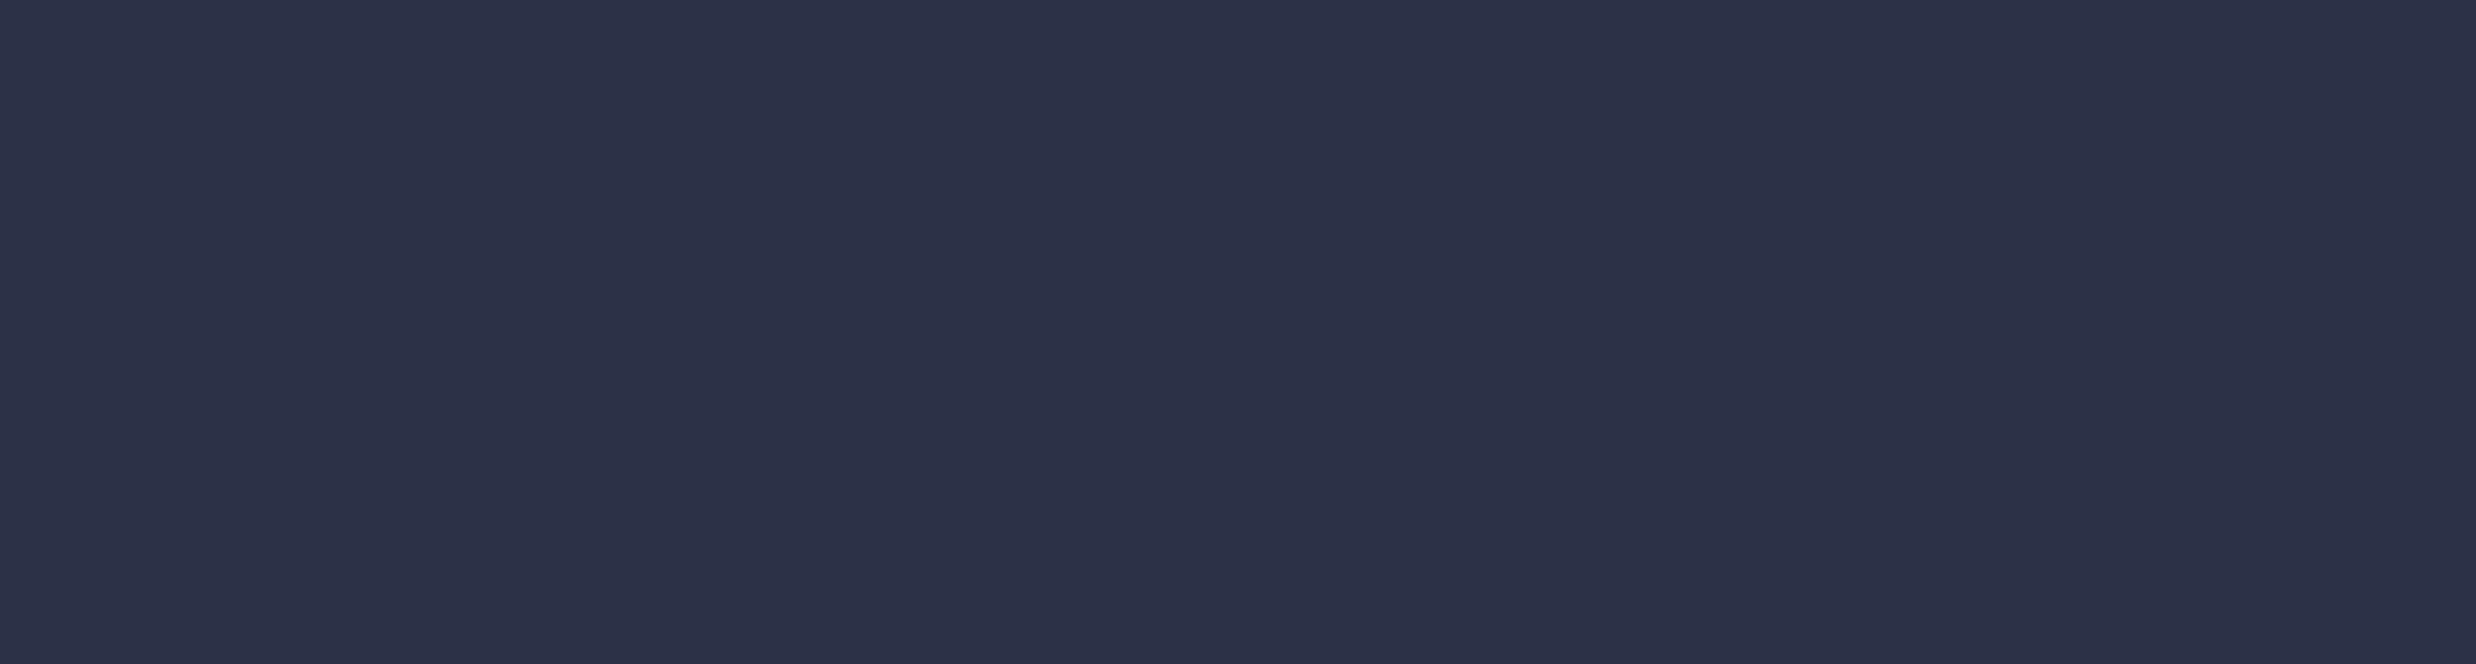 Tractor trailer flatbed clipart clipart transparent Car Hauler Truck Driving Jobs - CDL Job Now clipart transparent